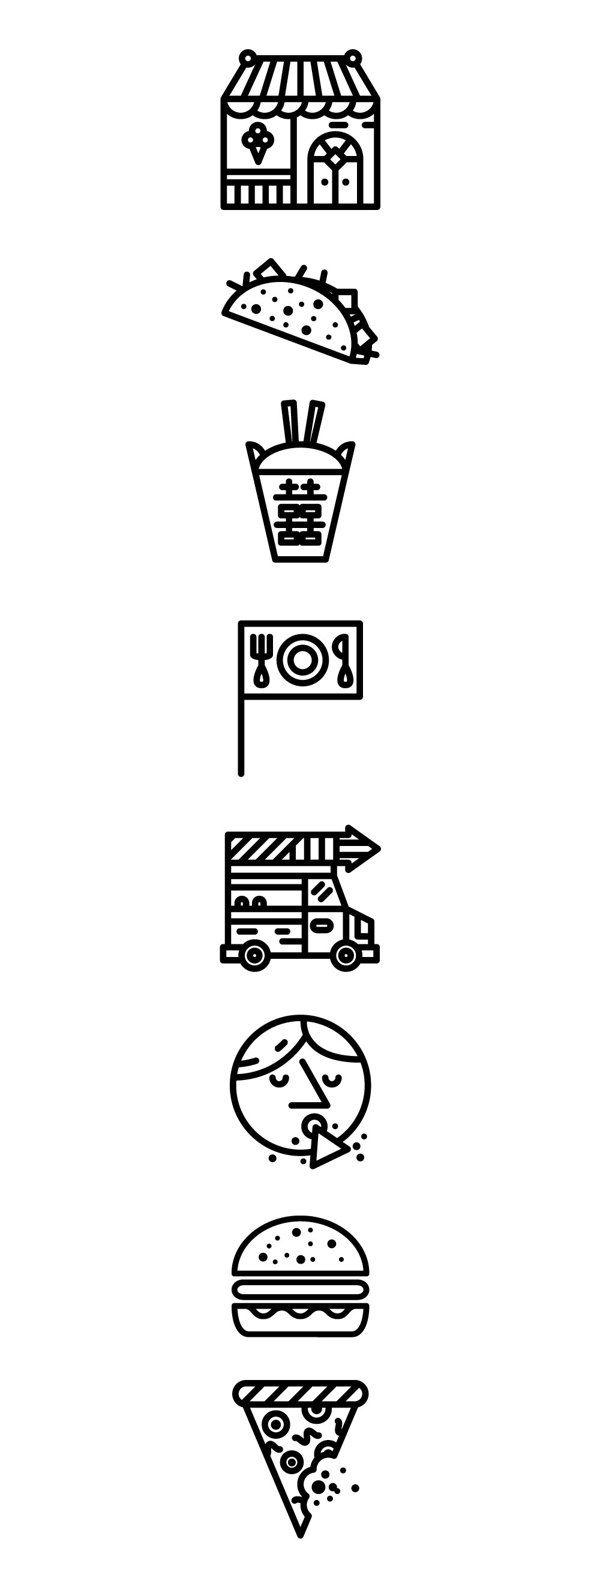 ✖✖✖ New York Mag Icons by Daniel Ting Chong, via Behance ✖✖✖